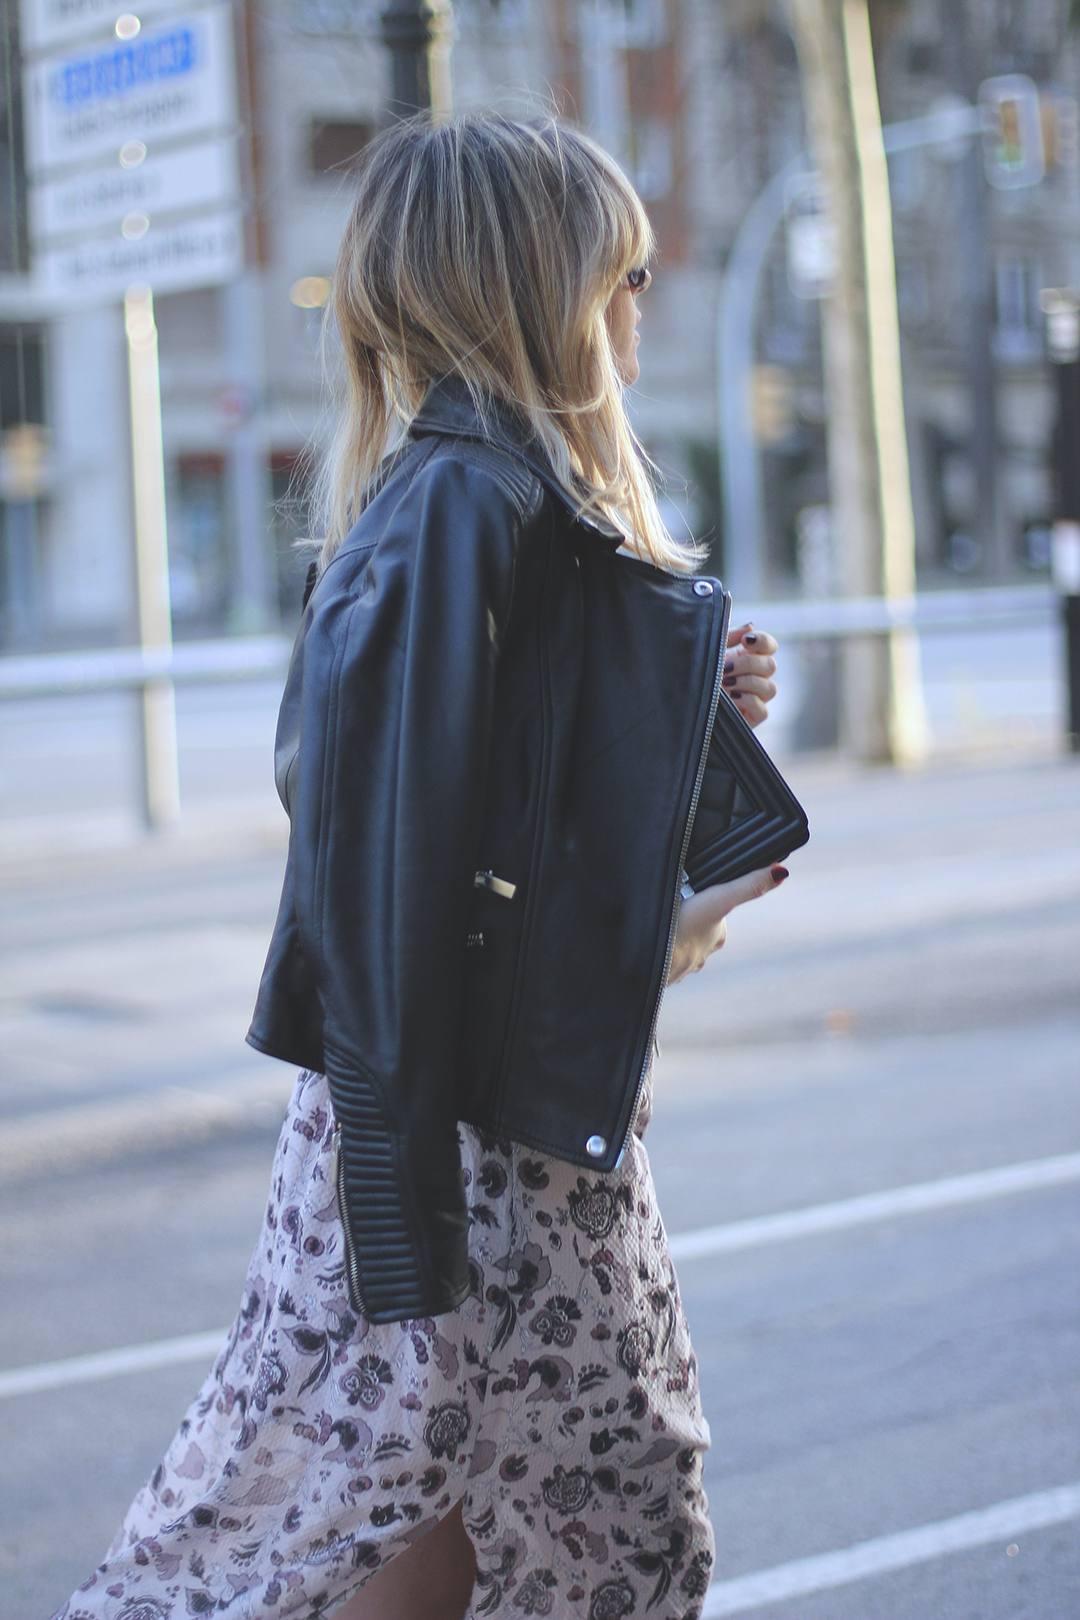 Biker-jacket-Monica-sors-fashion-blog-style-outfits-blogger-biker-jacket-2016-trends